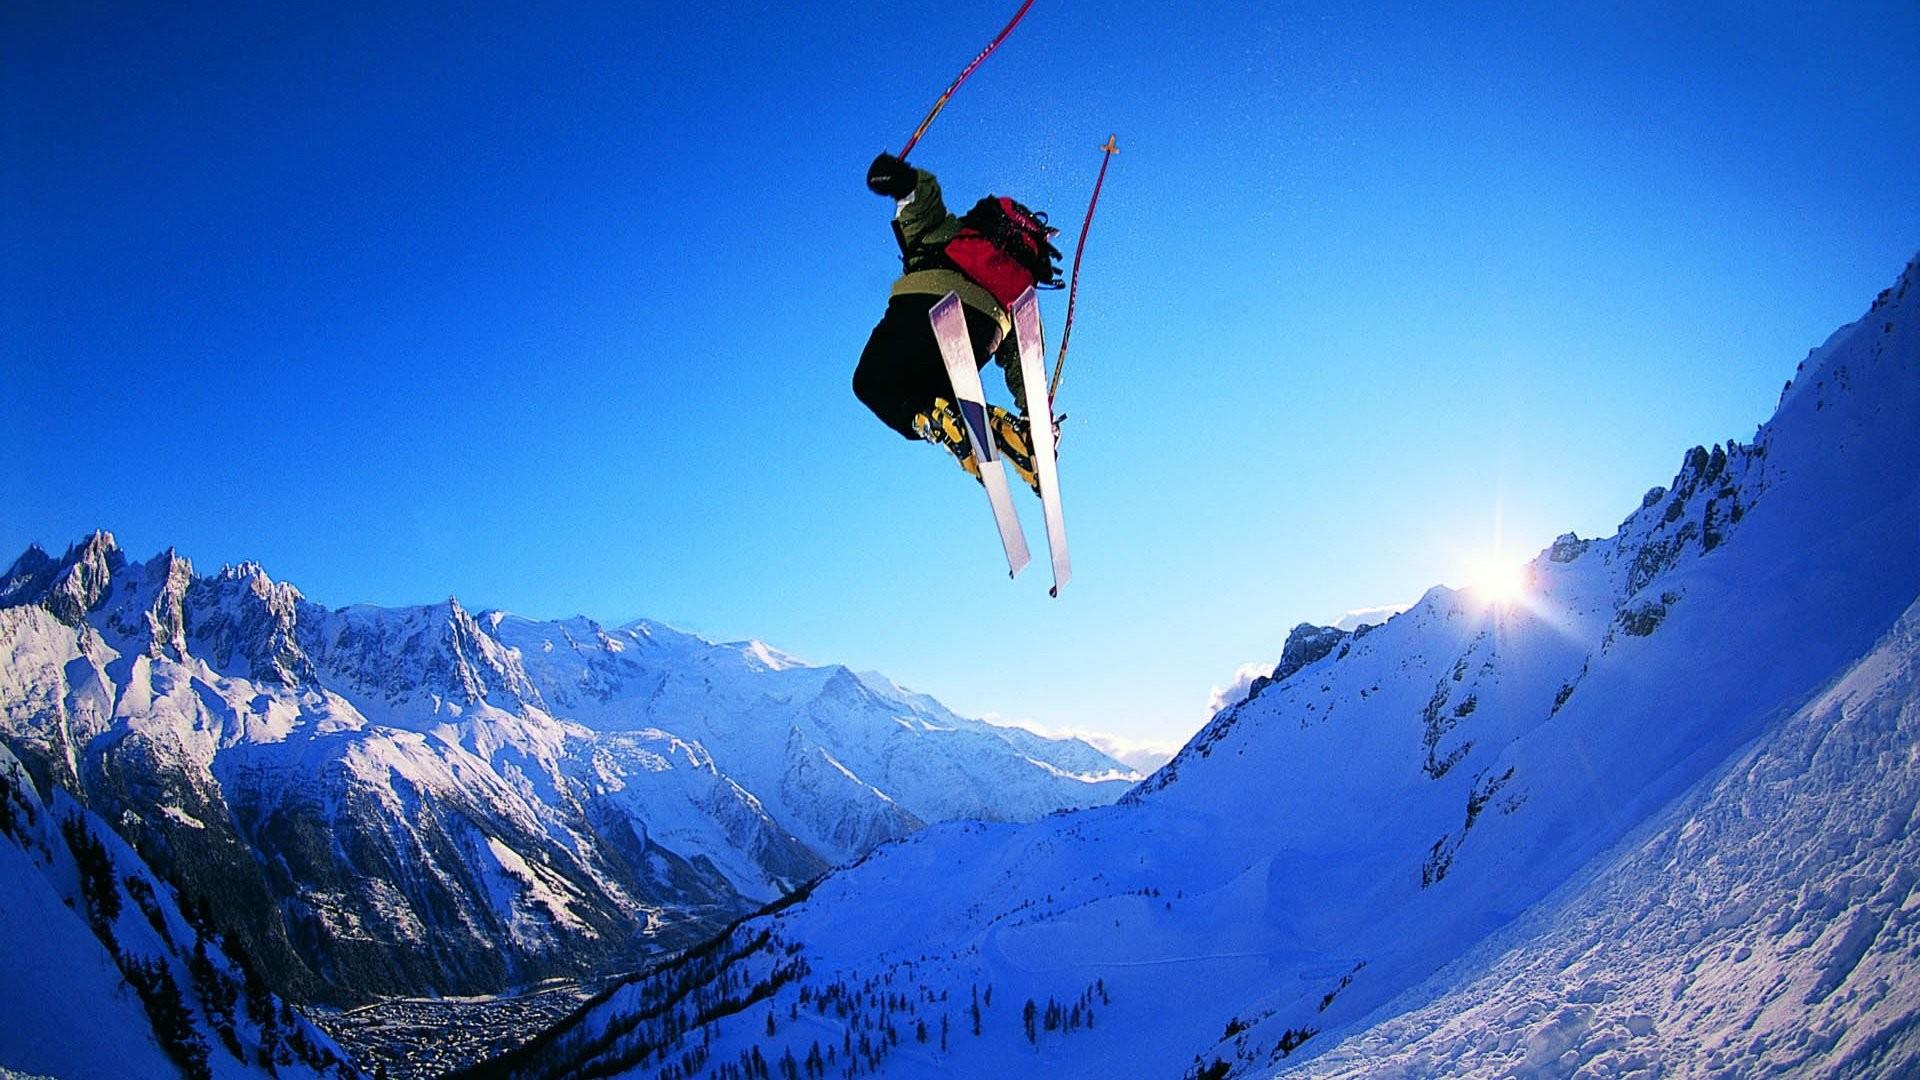 Ski Snowboard Wallpapers · K HD Desktop Backgrounds Phone Images Ski  Wallpaper Wallpapers)